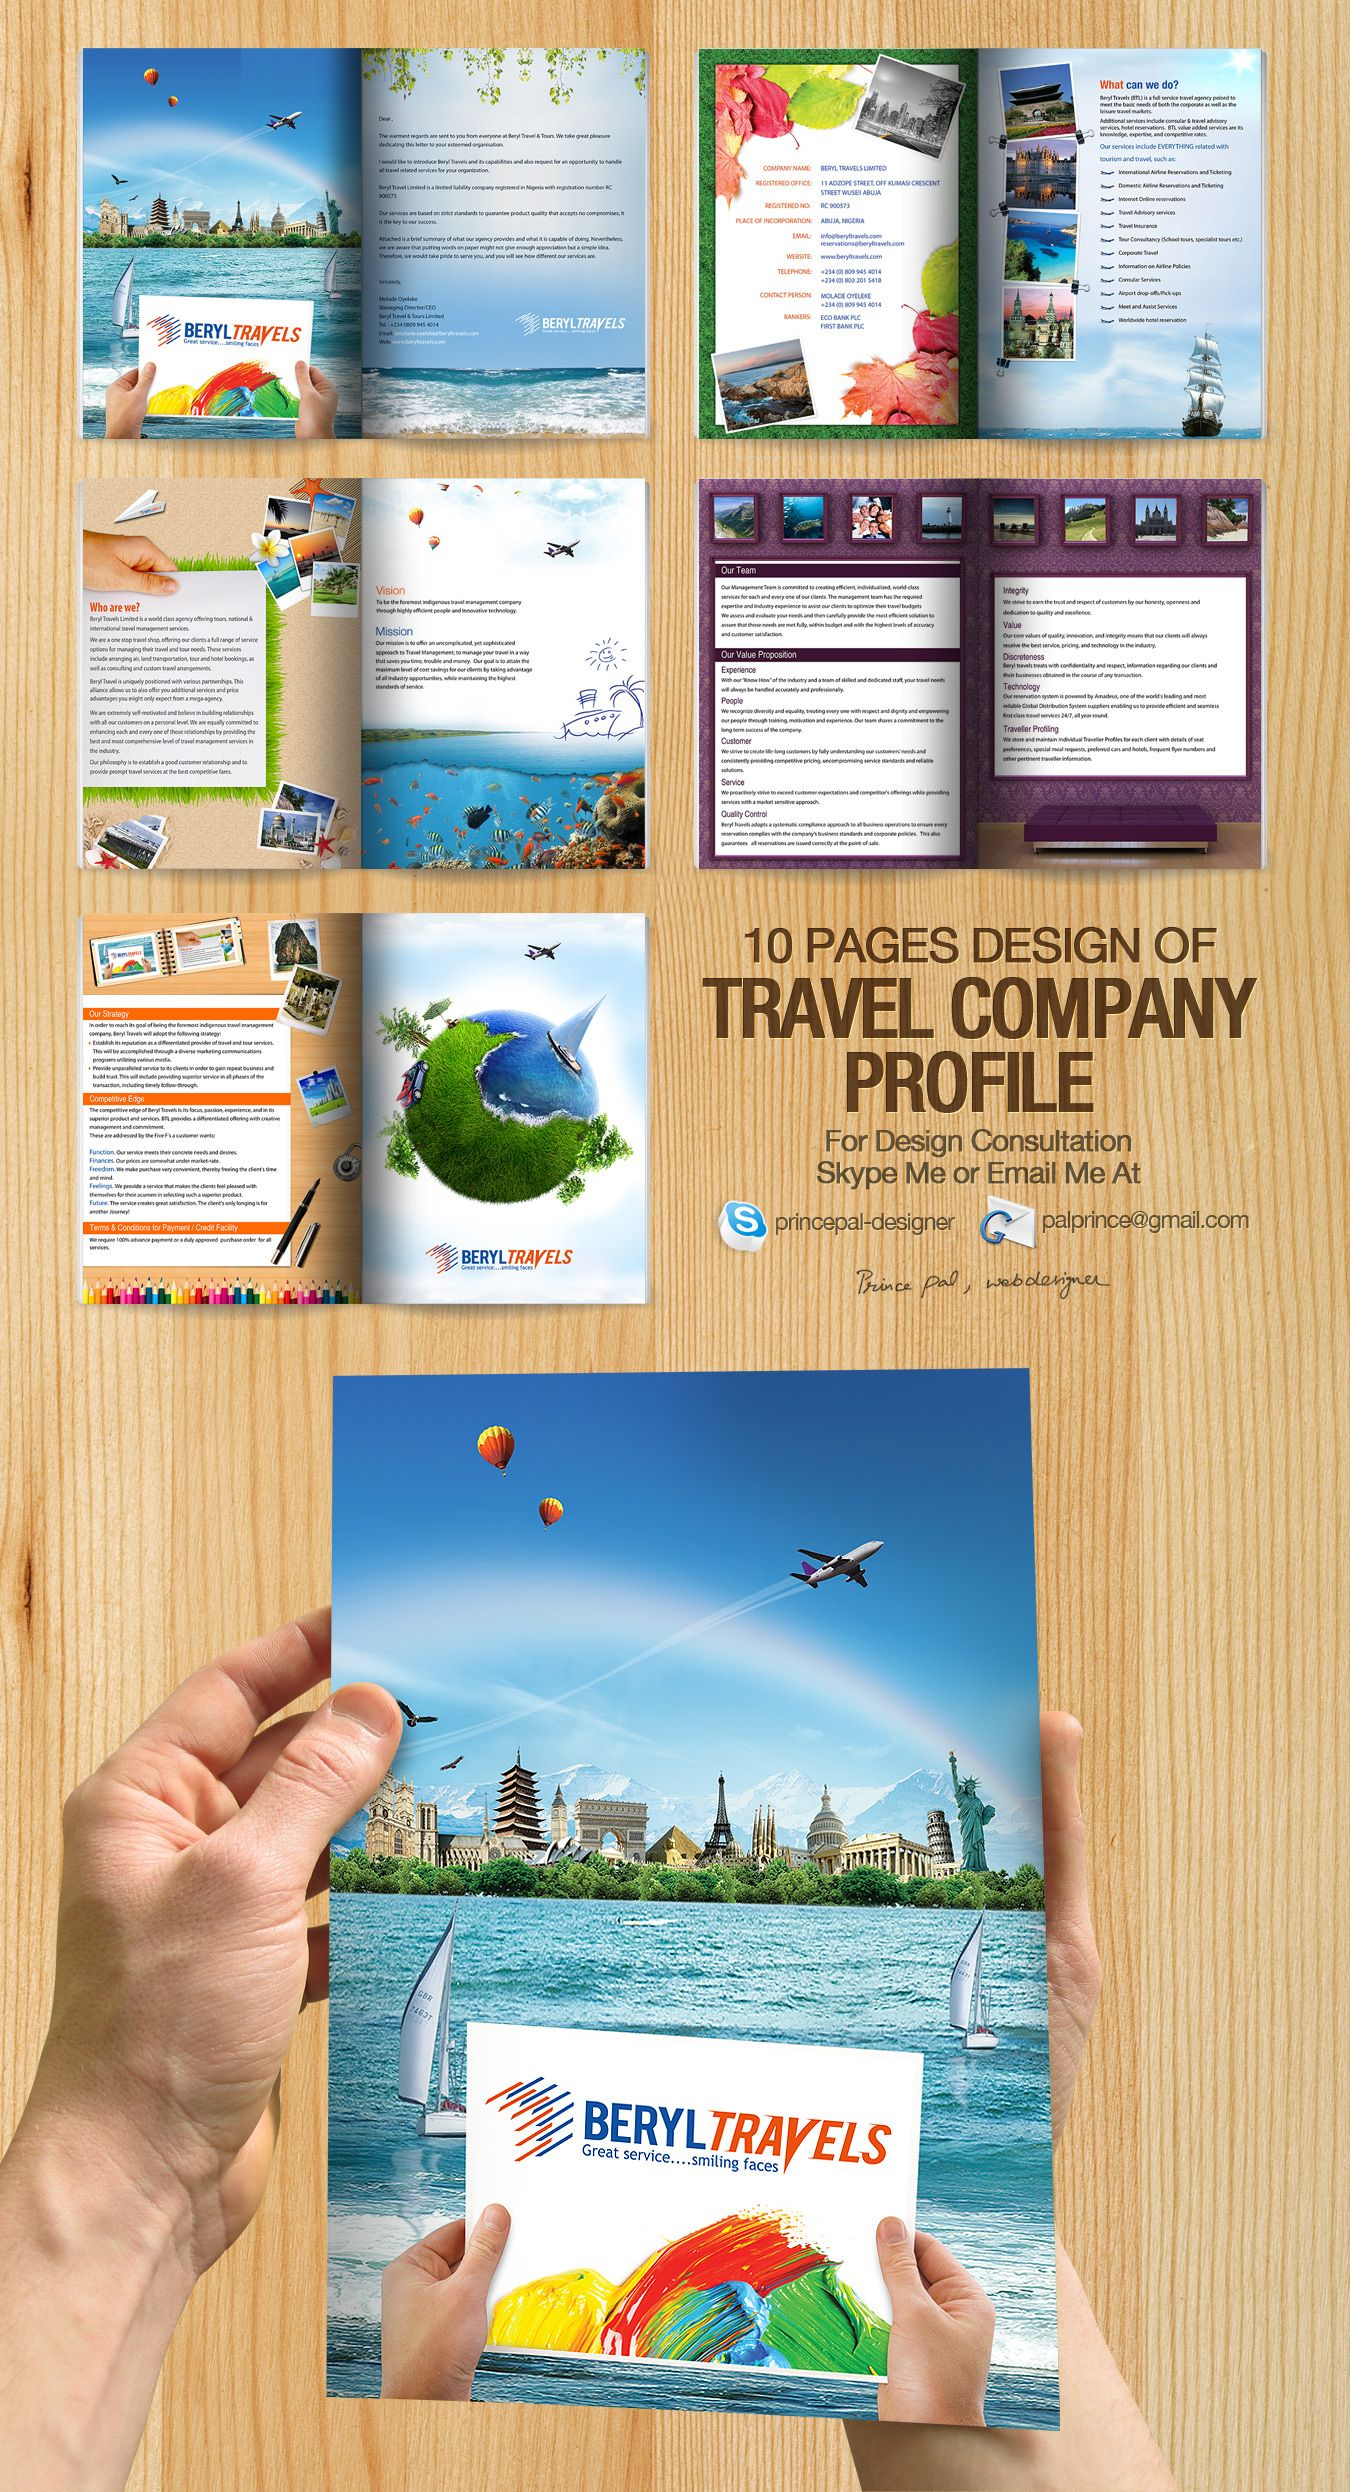 Company Profile Tour And Travel : company, profile, travel, Travel, Company, Profile